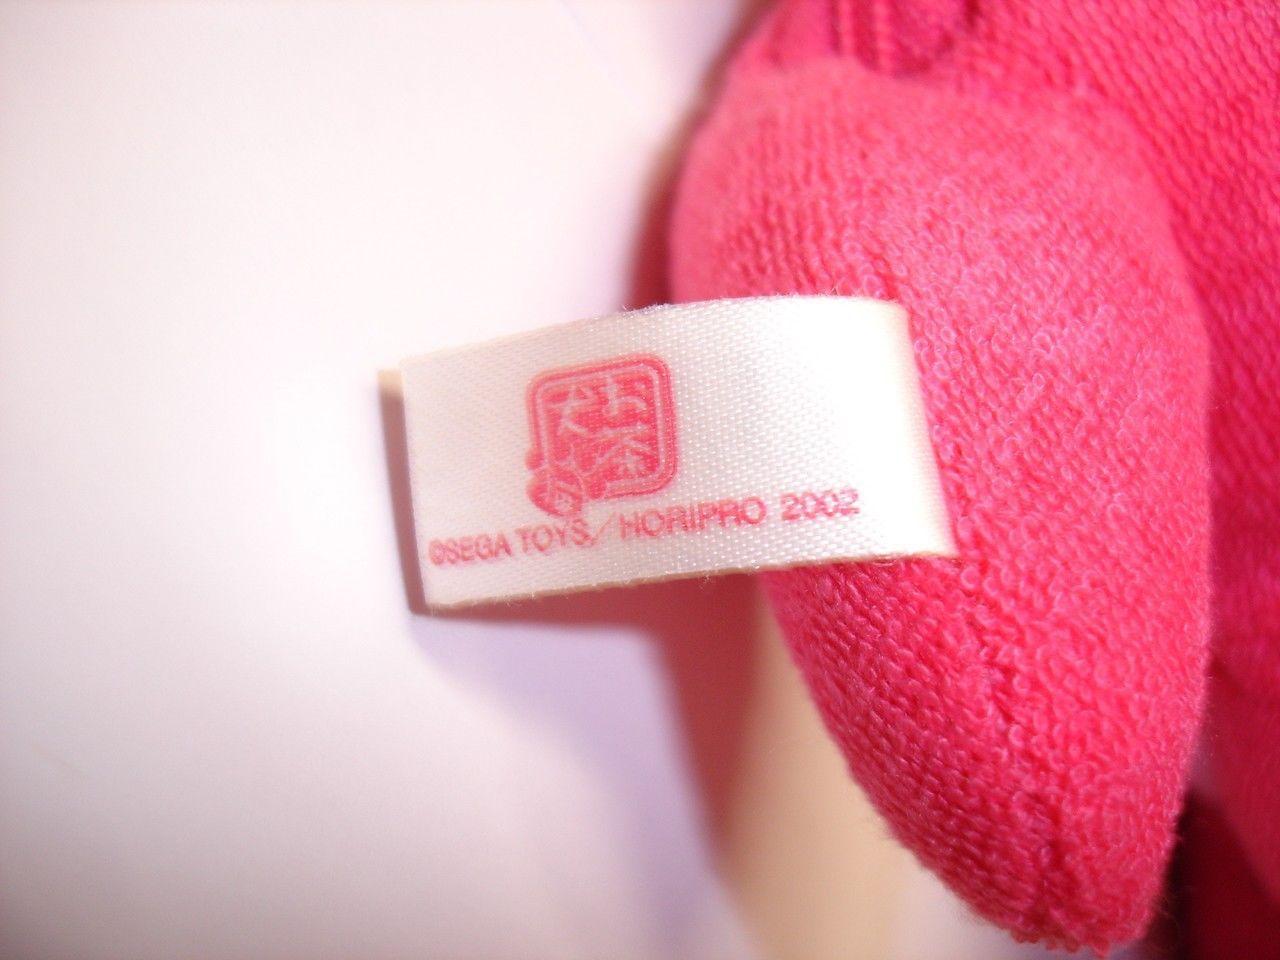 "Sega toys Horipro Ocha-Ken tea puppy Sakura 7.5"" cat plush stuffed doll figure image 7"